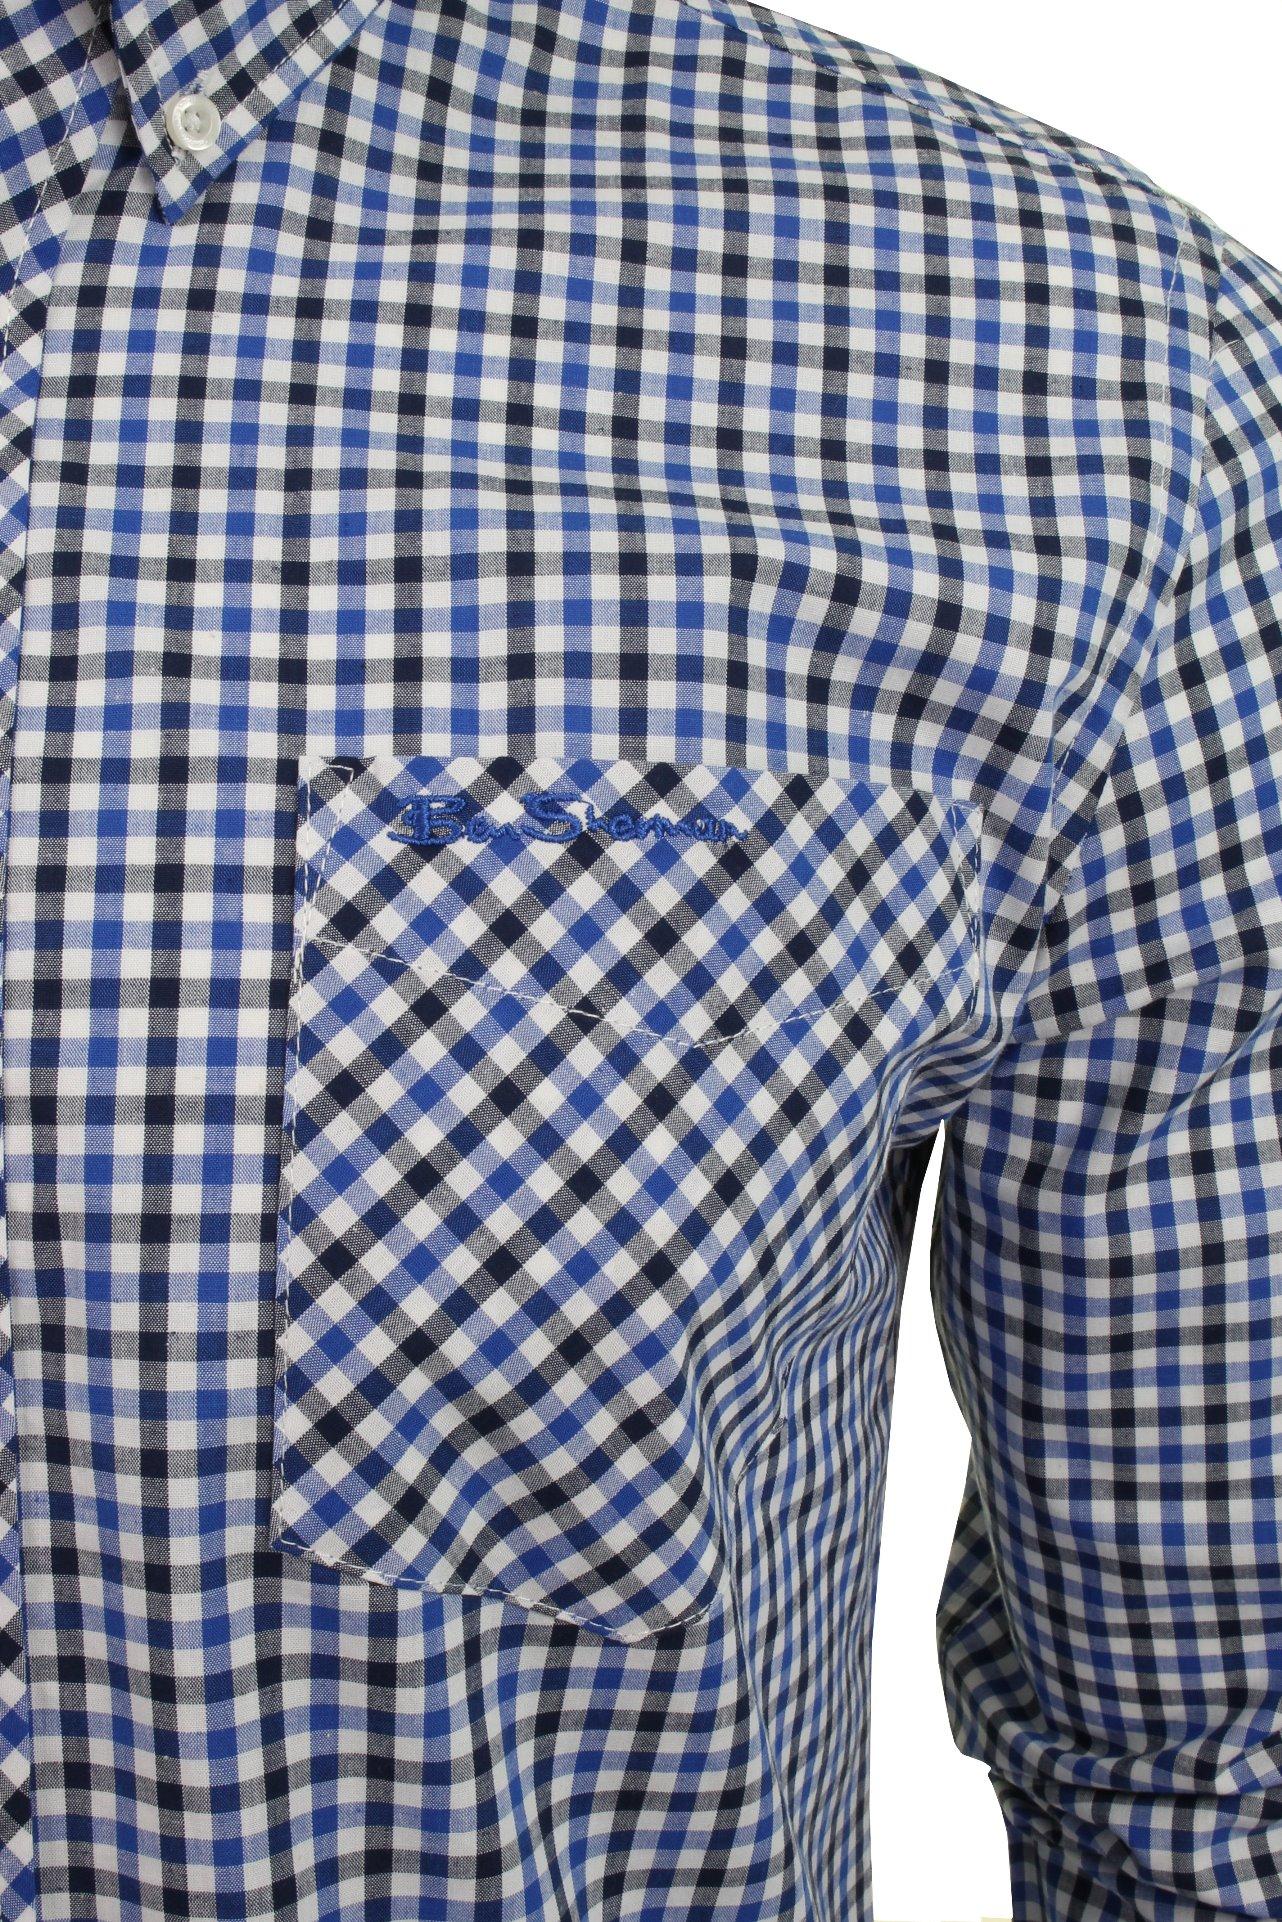 Ben-Sherman-Men-039-s-Long-Sleeved-Gingham-Check-Shirt miniatuur 4